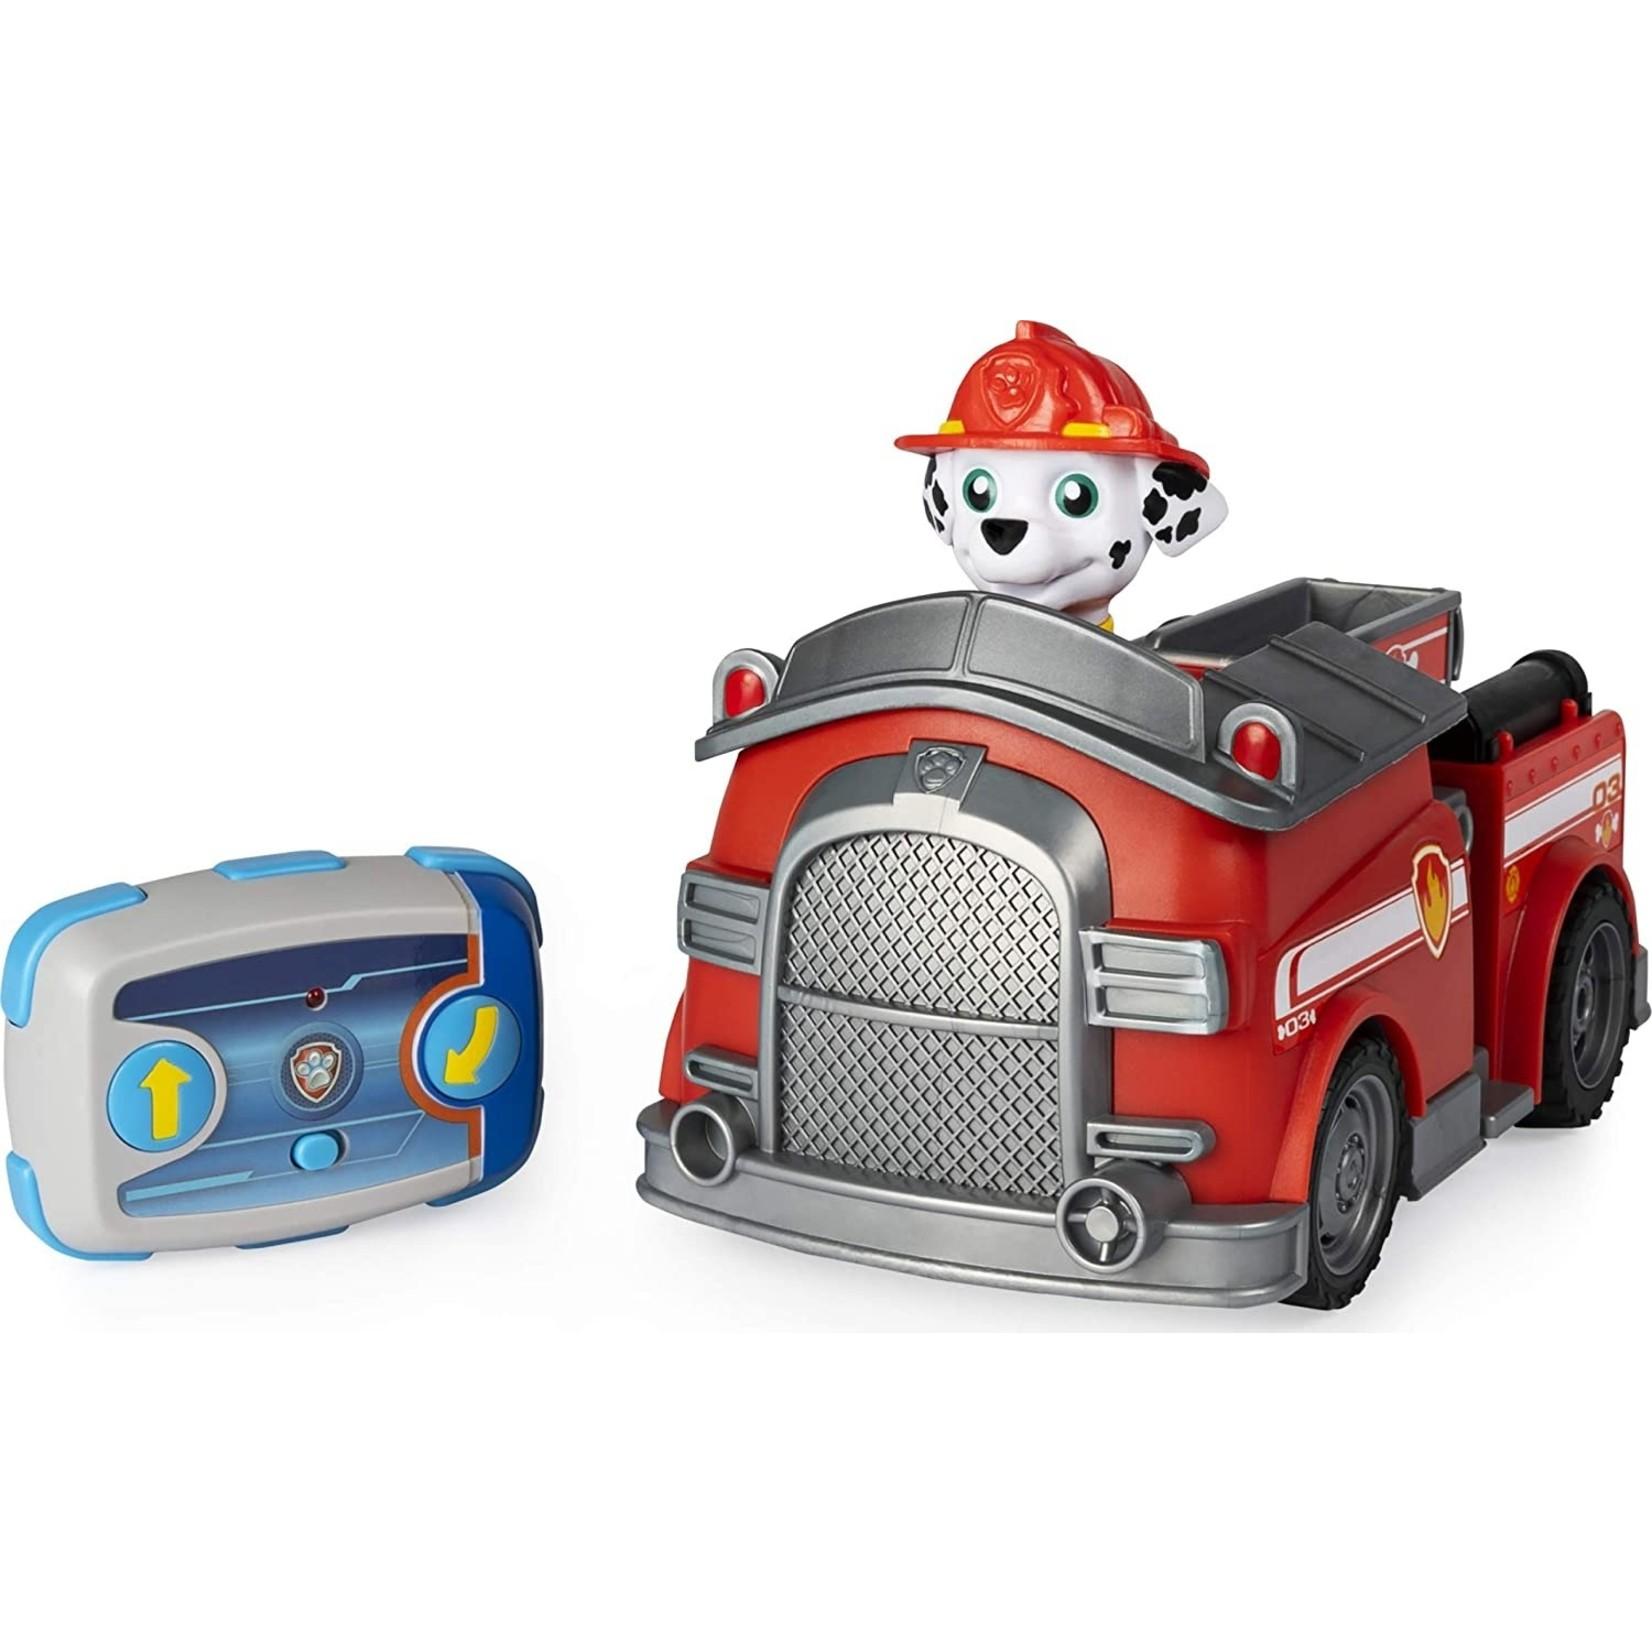 Spin Master Paw Patrol Marshall R/C Fire Truck